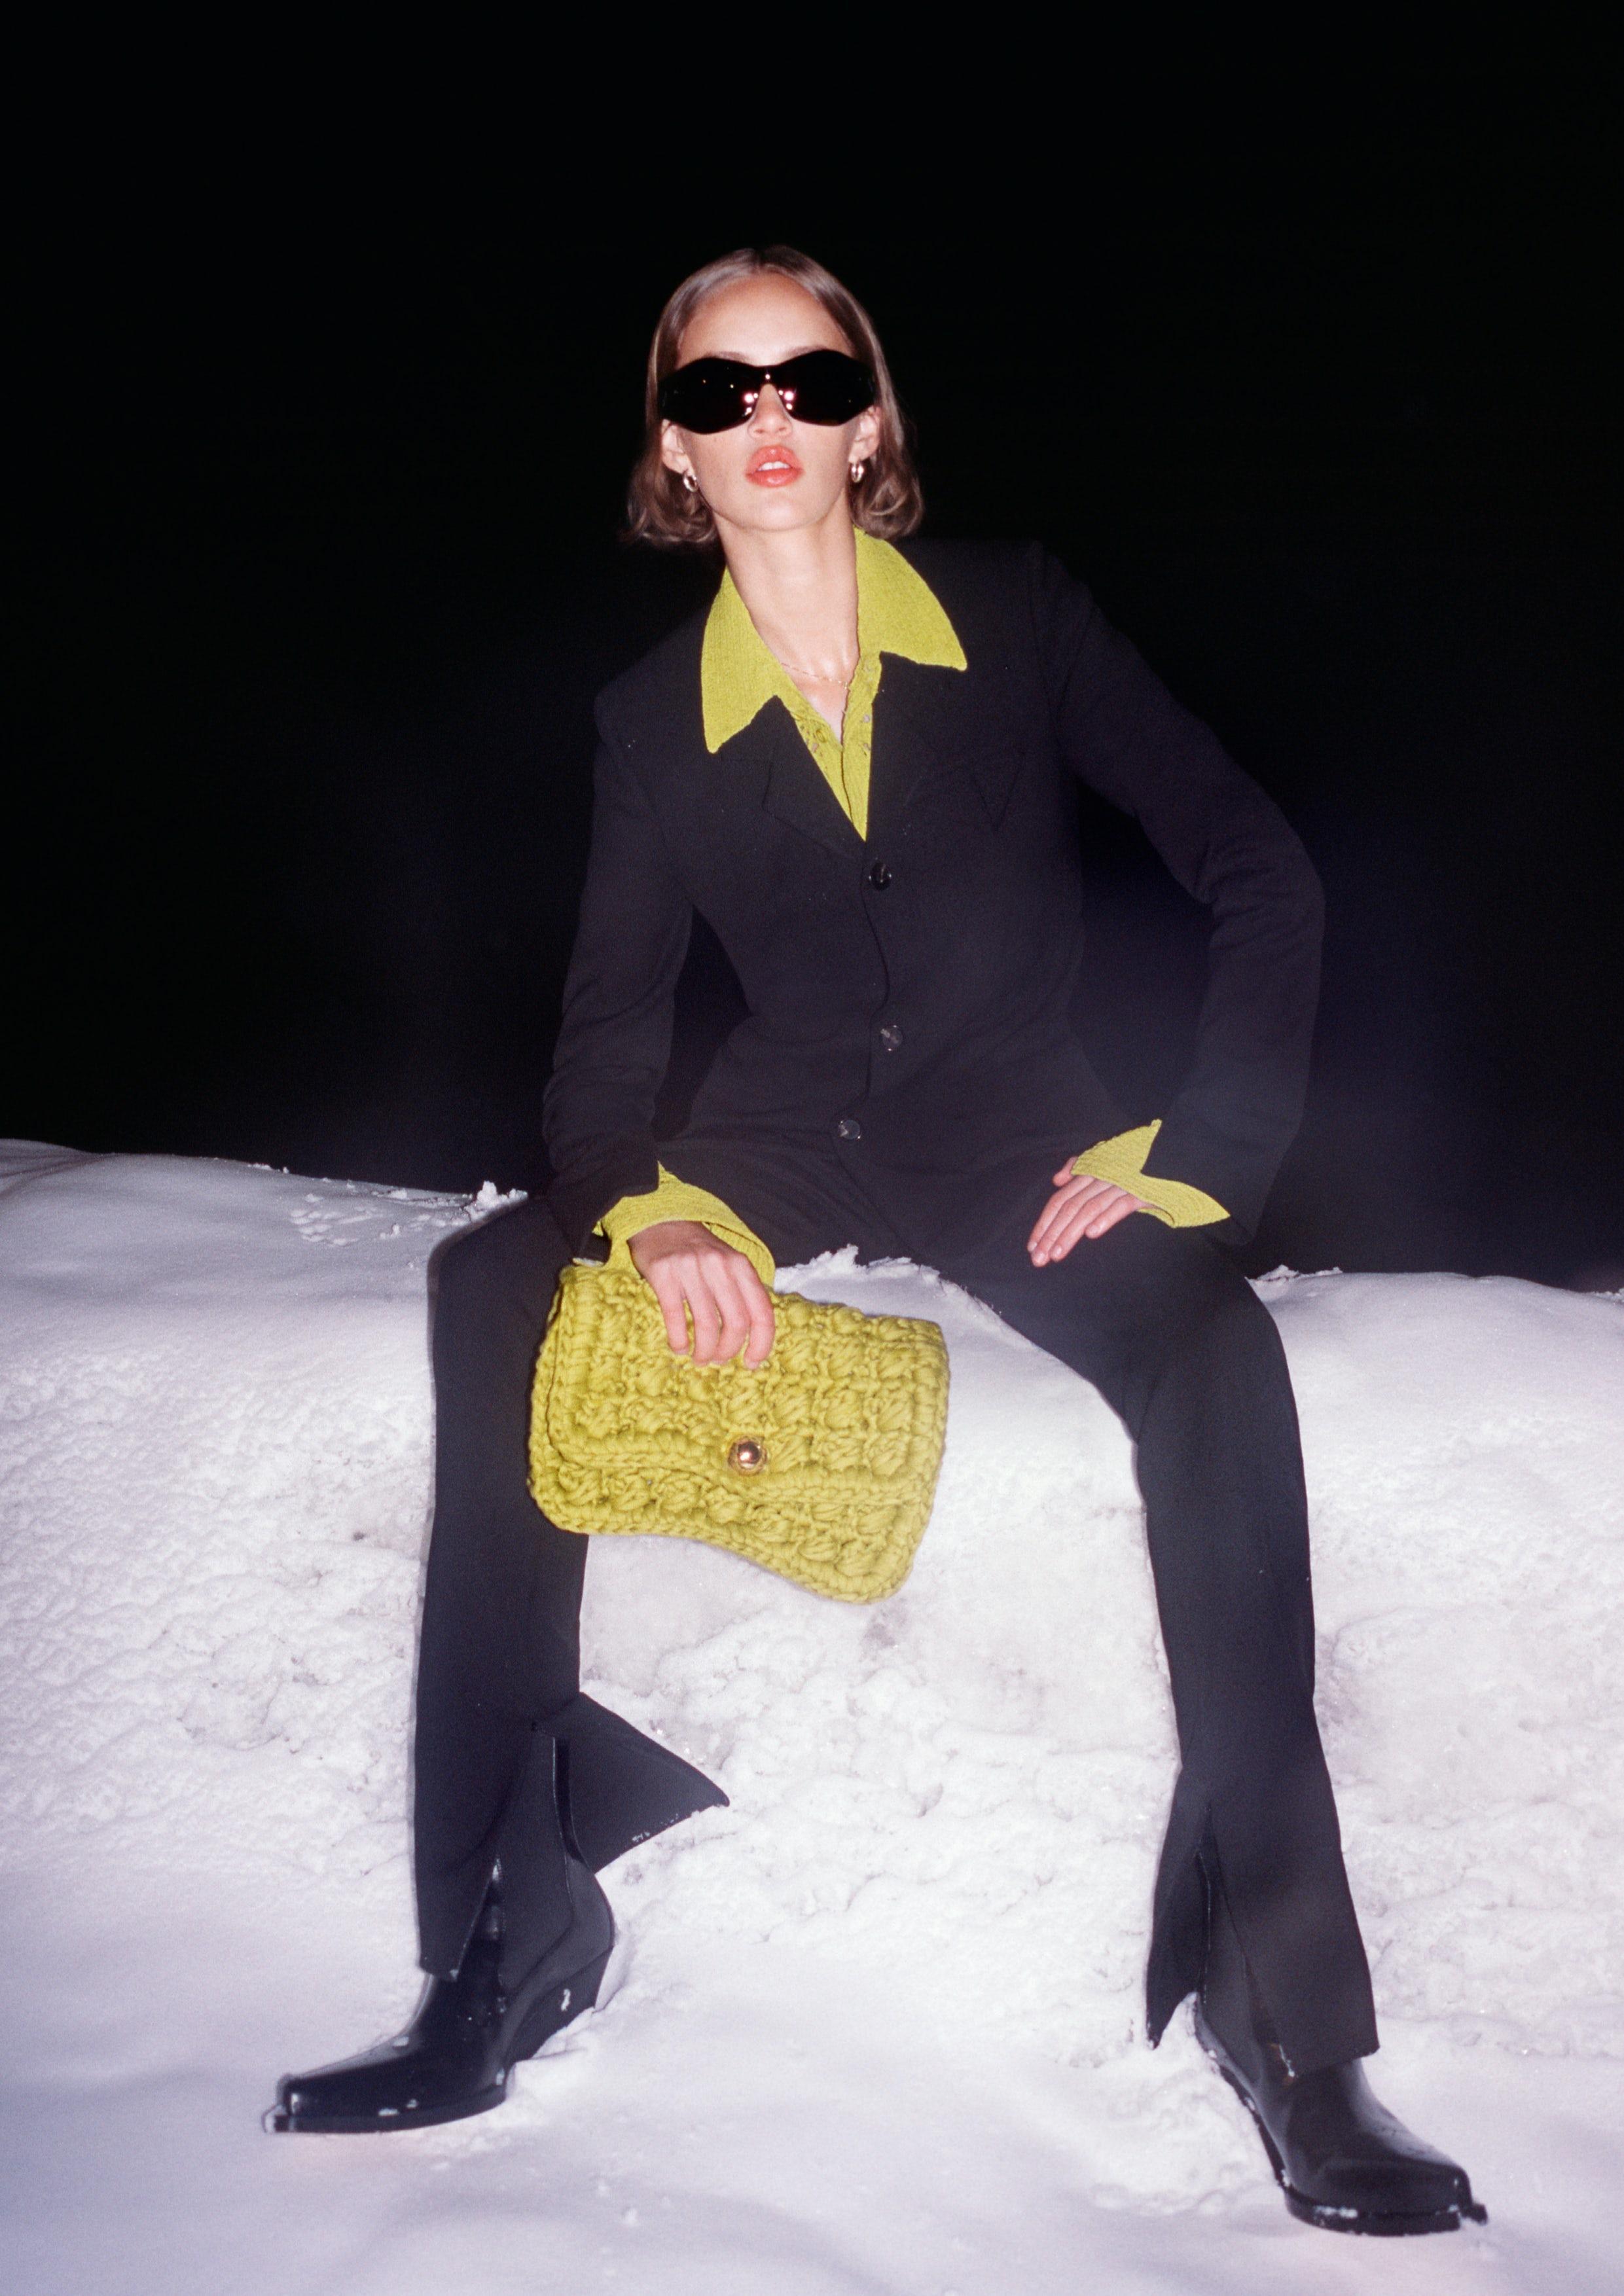 An image from Bottega Veneta\'s Fall 2020 Campaign by photographer Tyrone Lebon